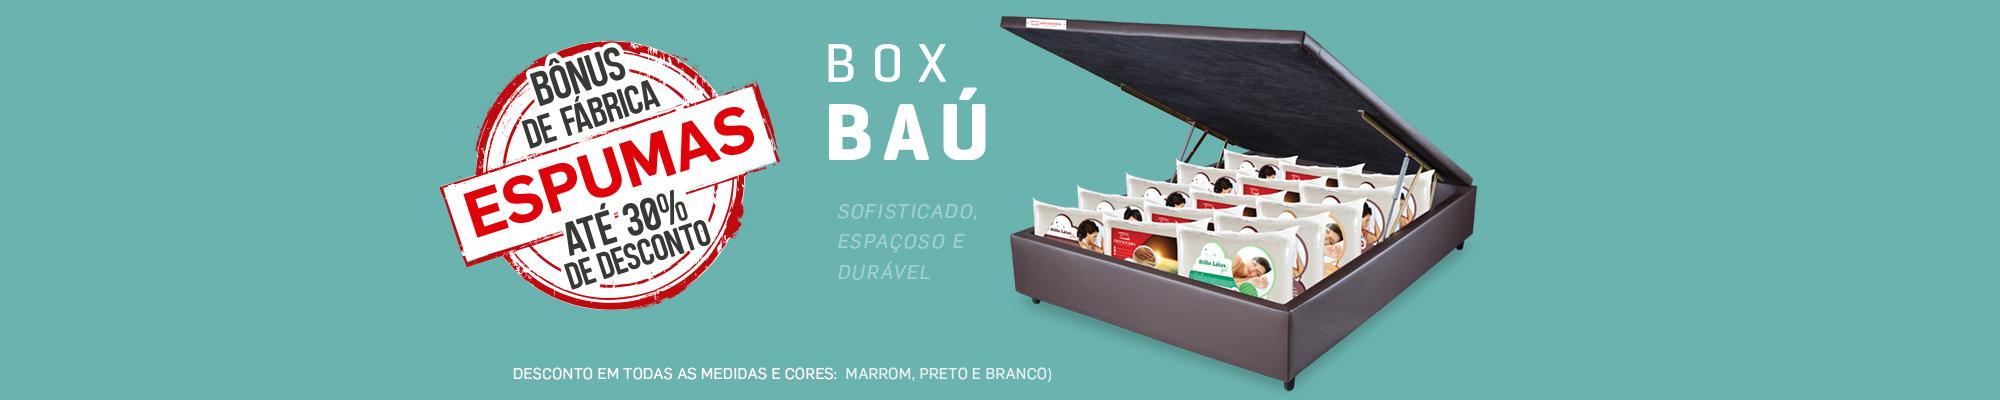 Bonus de Fabrica Box Bau